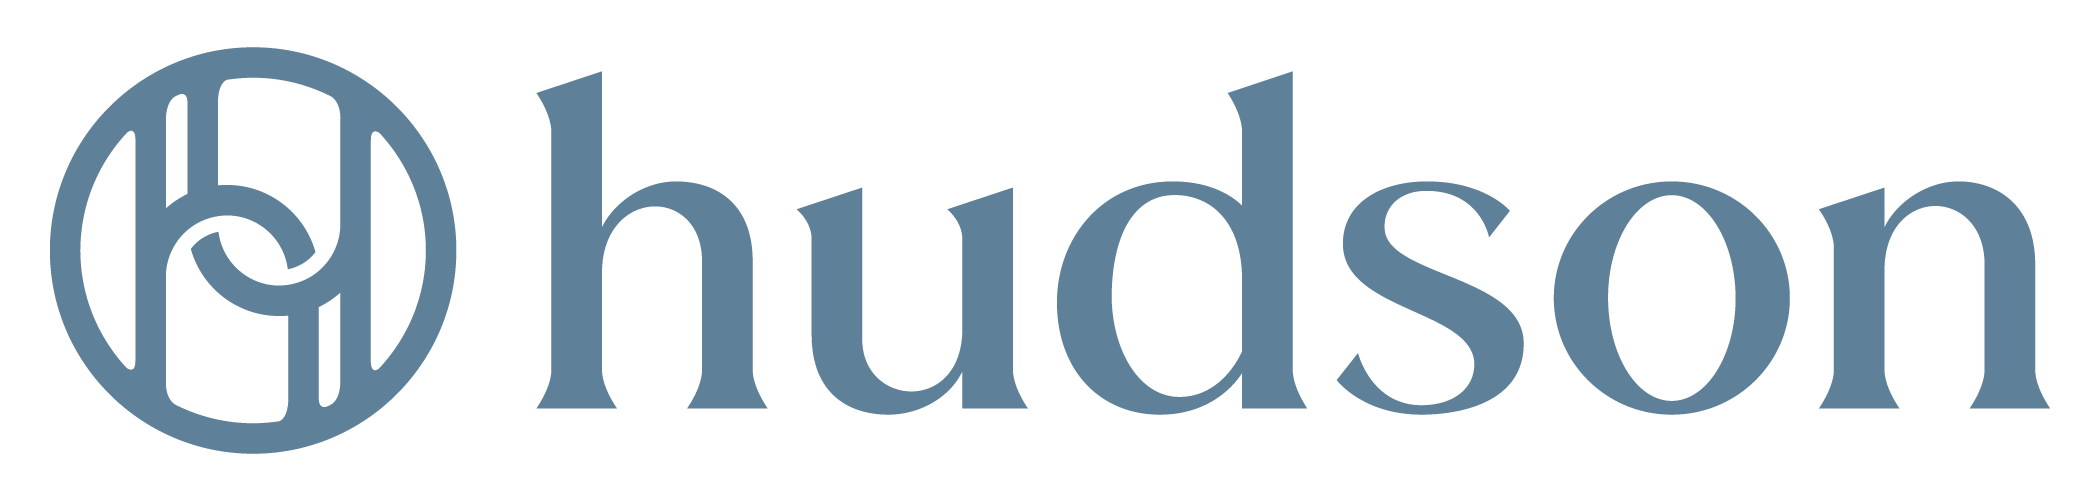 HUDSON_RGB_logo blue 02.png